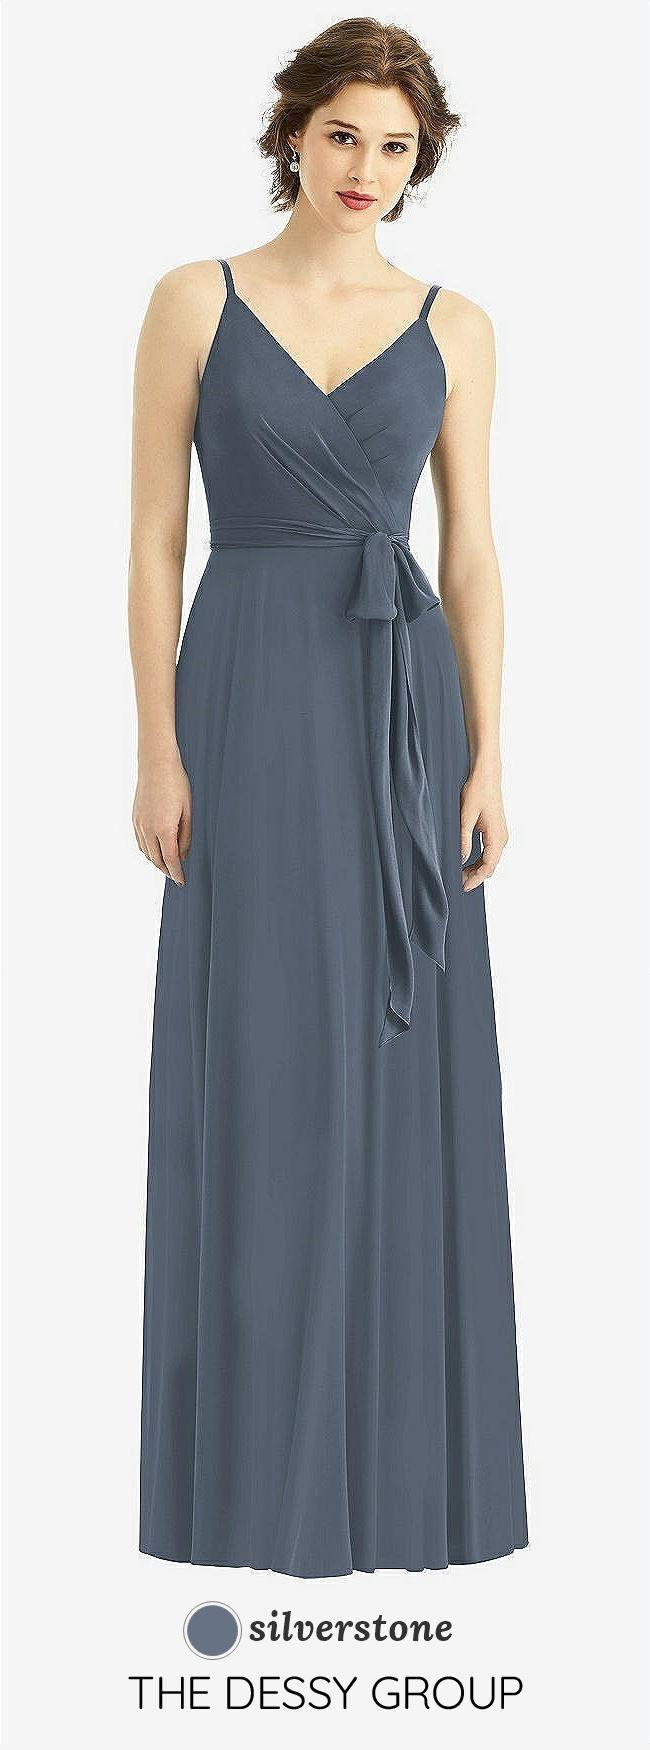 Moody Mismatched Slate Blue Bridesmaid Dresses Slate Blue Bridesmaid Dresses Dusty Blue Bridesmaid Dresses Blue Bridesmaid Dresses [ 1750 x 650 Pixel ]